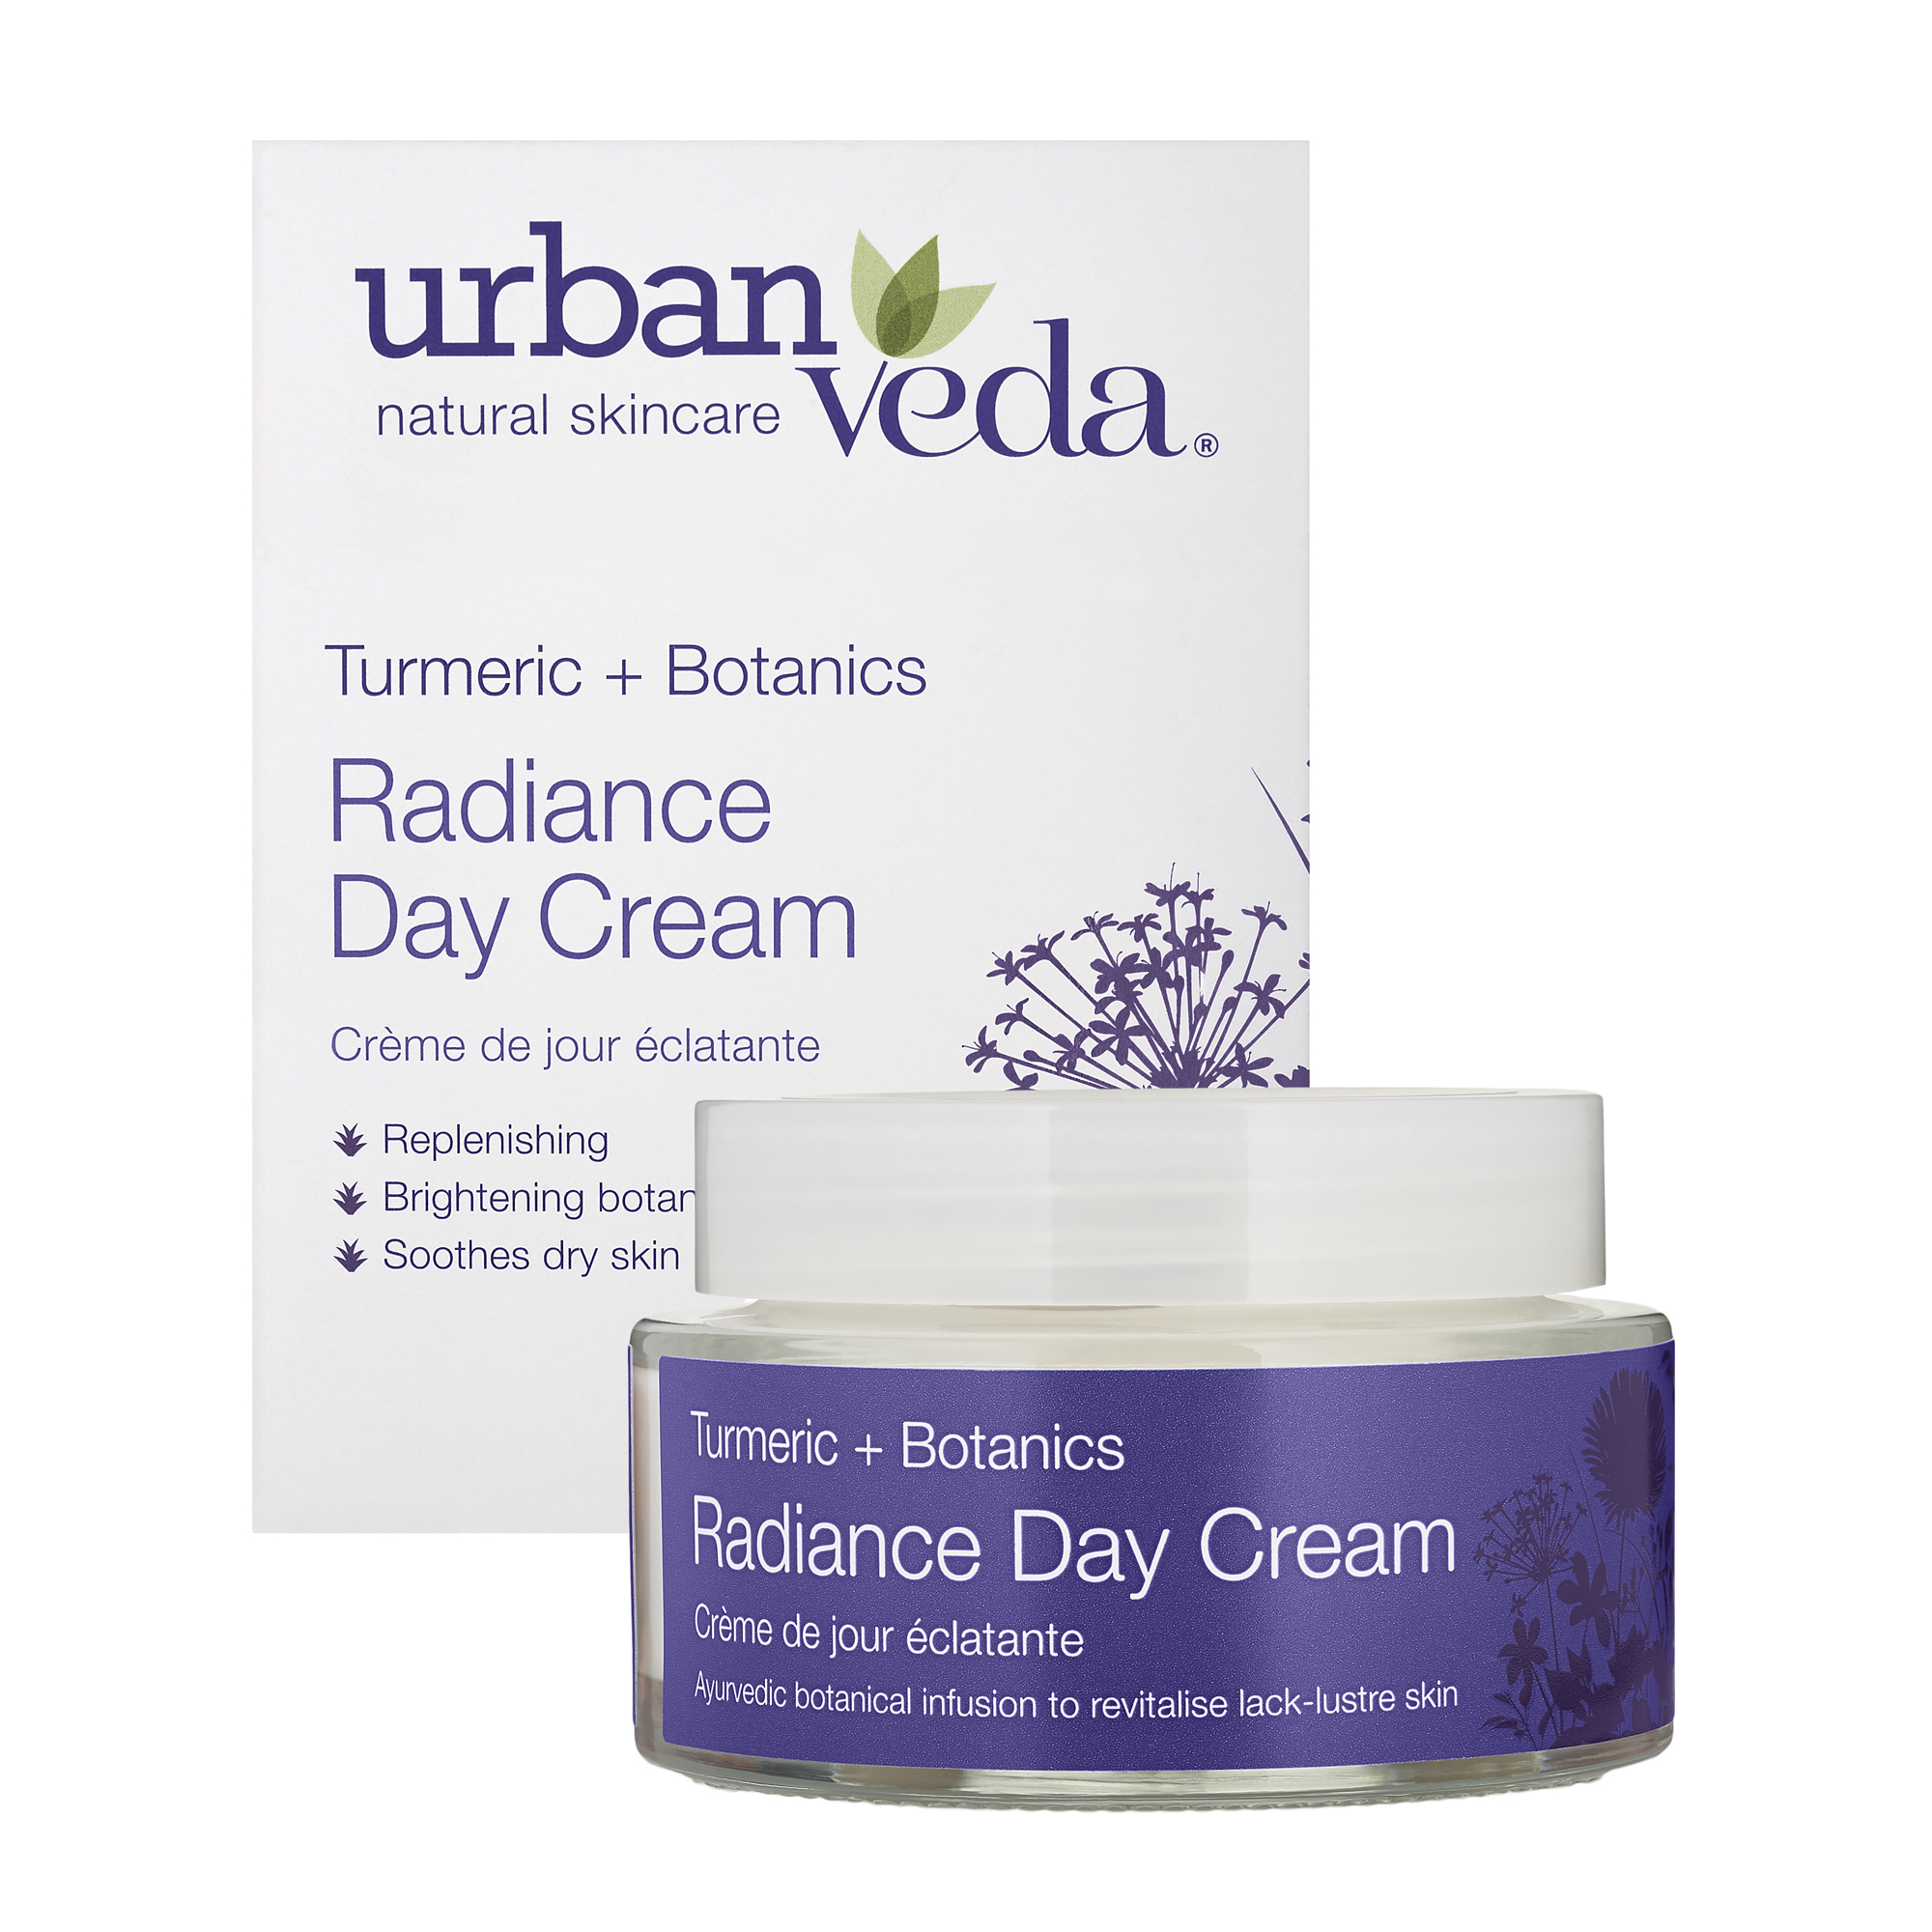 Urban Veda | Urban Veda Radiance Turmeric Day Cream, 50ml